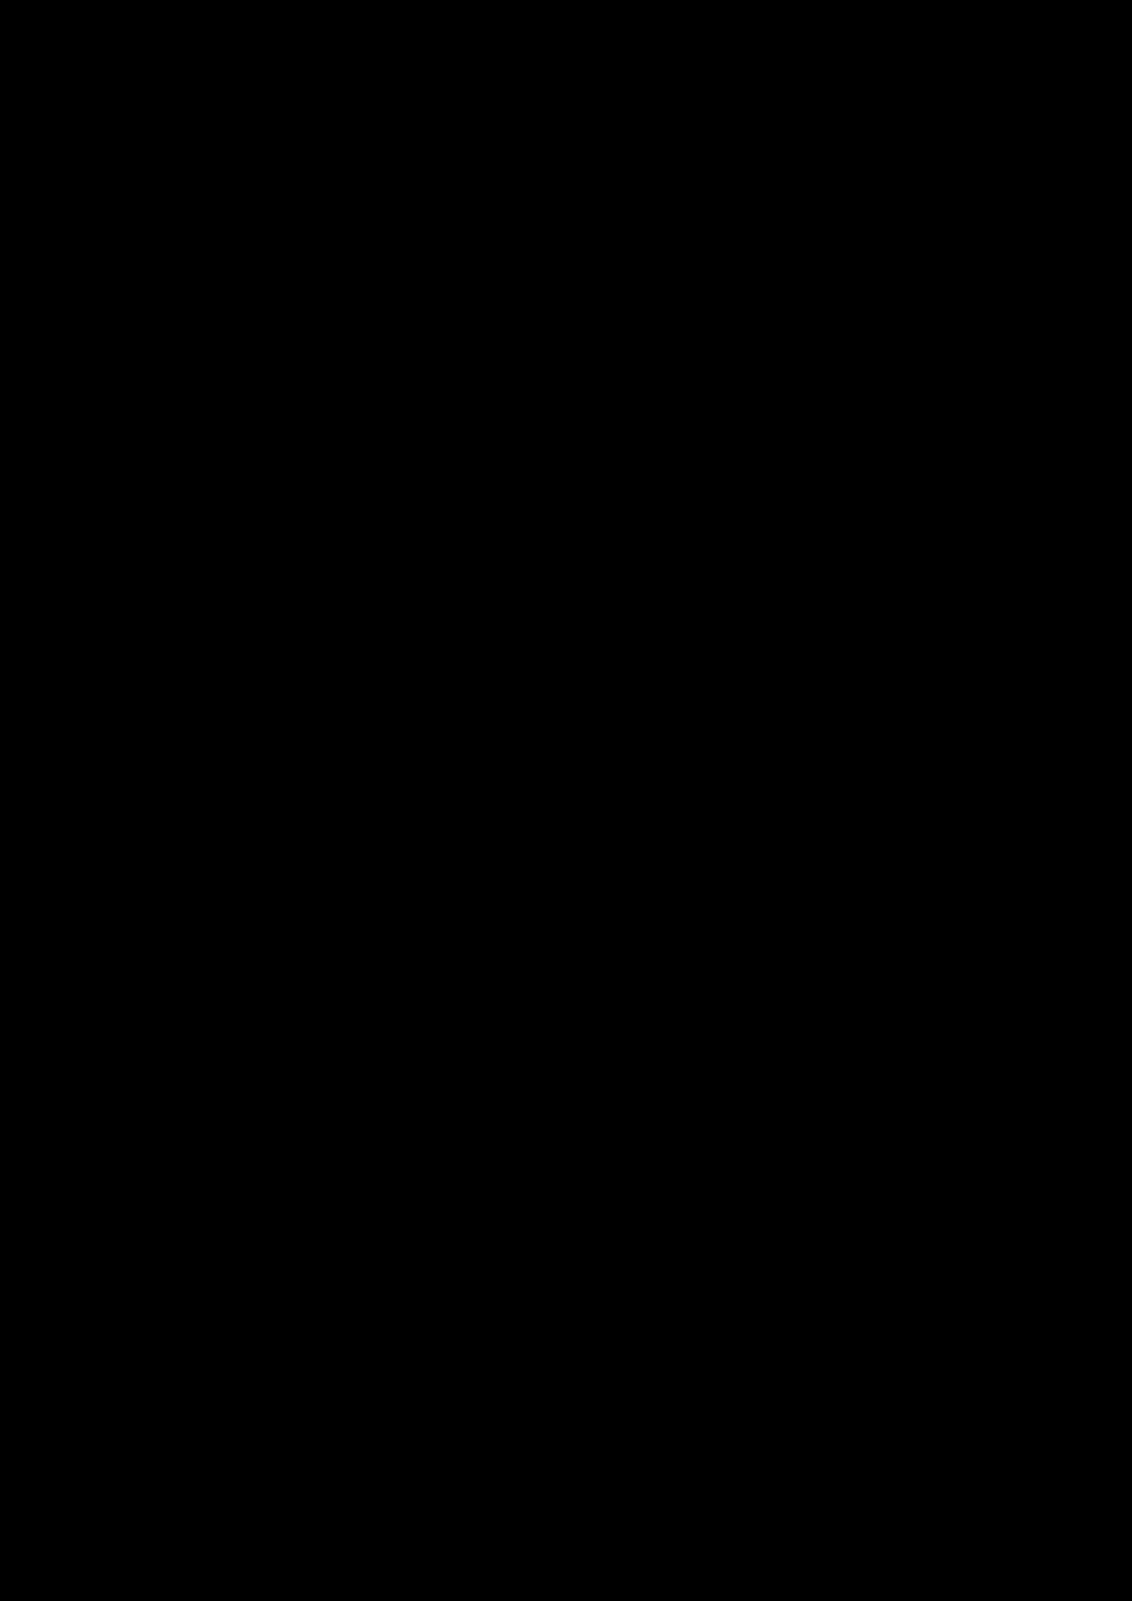 Ten lyubvi slide, Image 14